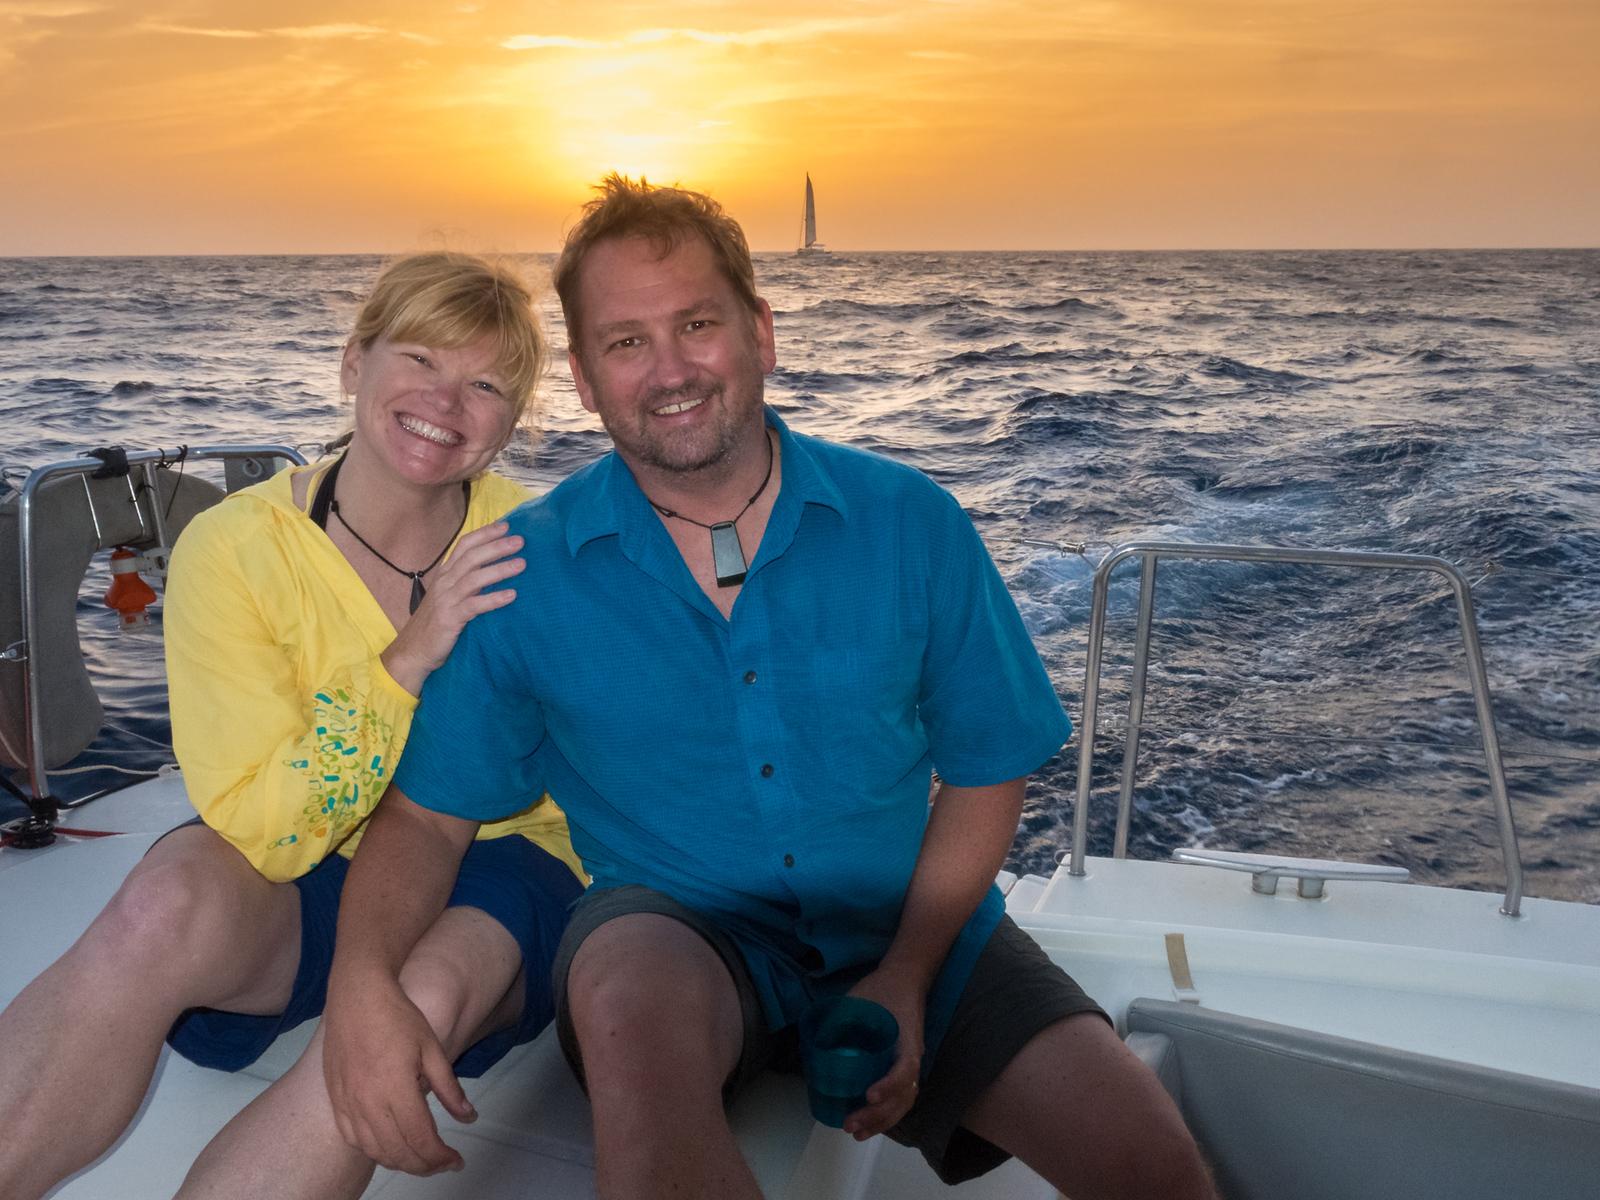 Enjoying the sunset from a catamaran.